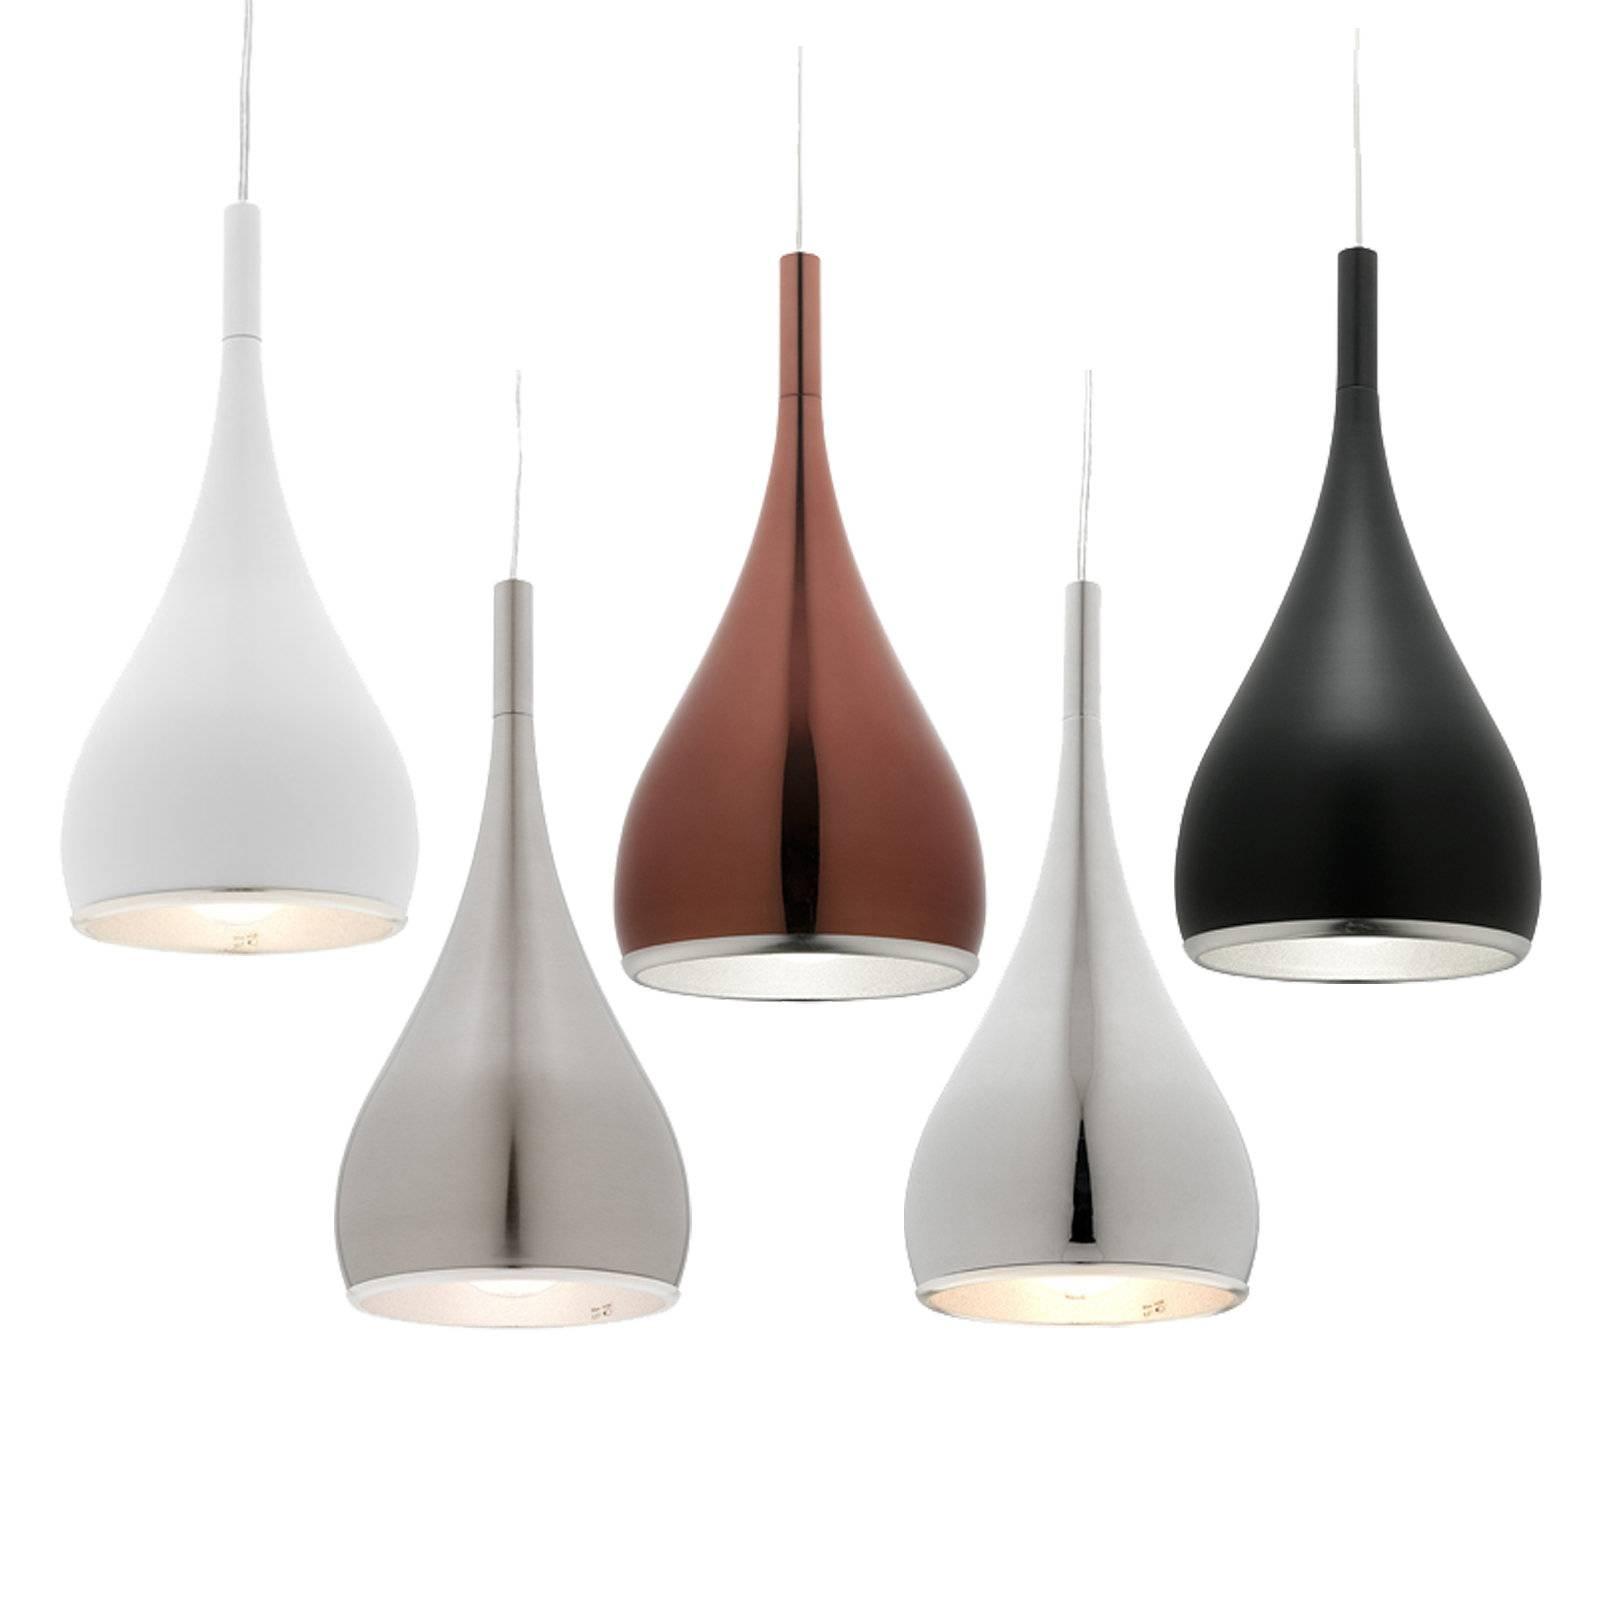 Teardrop Pendant Light - Hbwonong regarding Teardrop Pendant Lights Fixtures (Image 14 of 15)